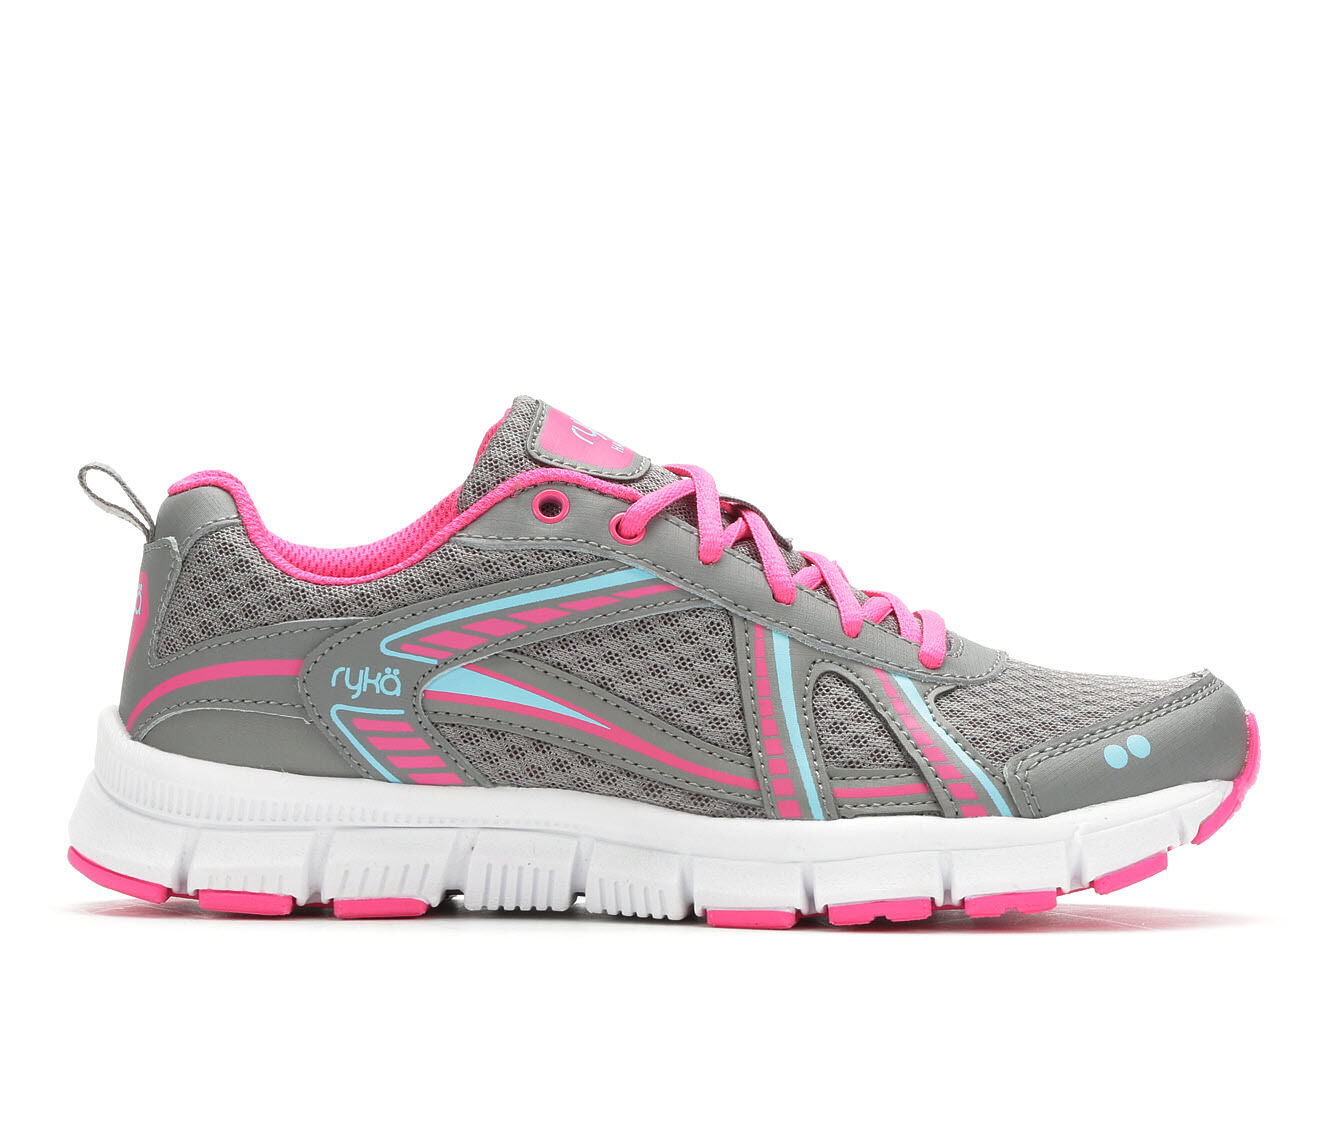 Women's Ryka Hailee Training Shoes Grey/Pink/Blue